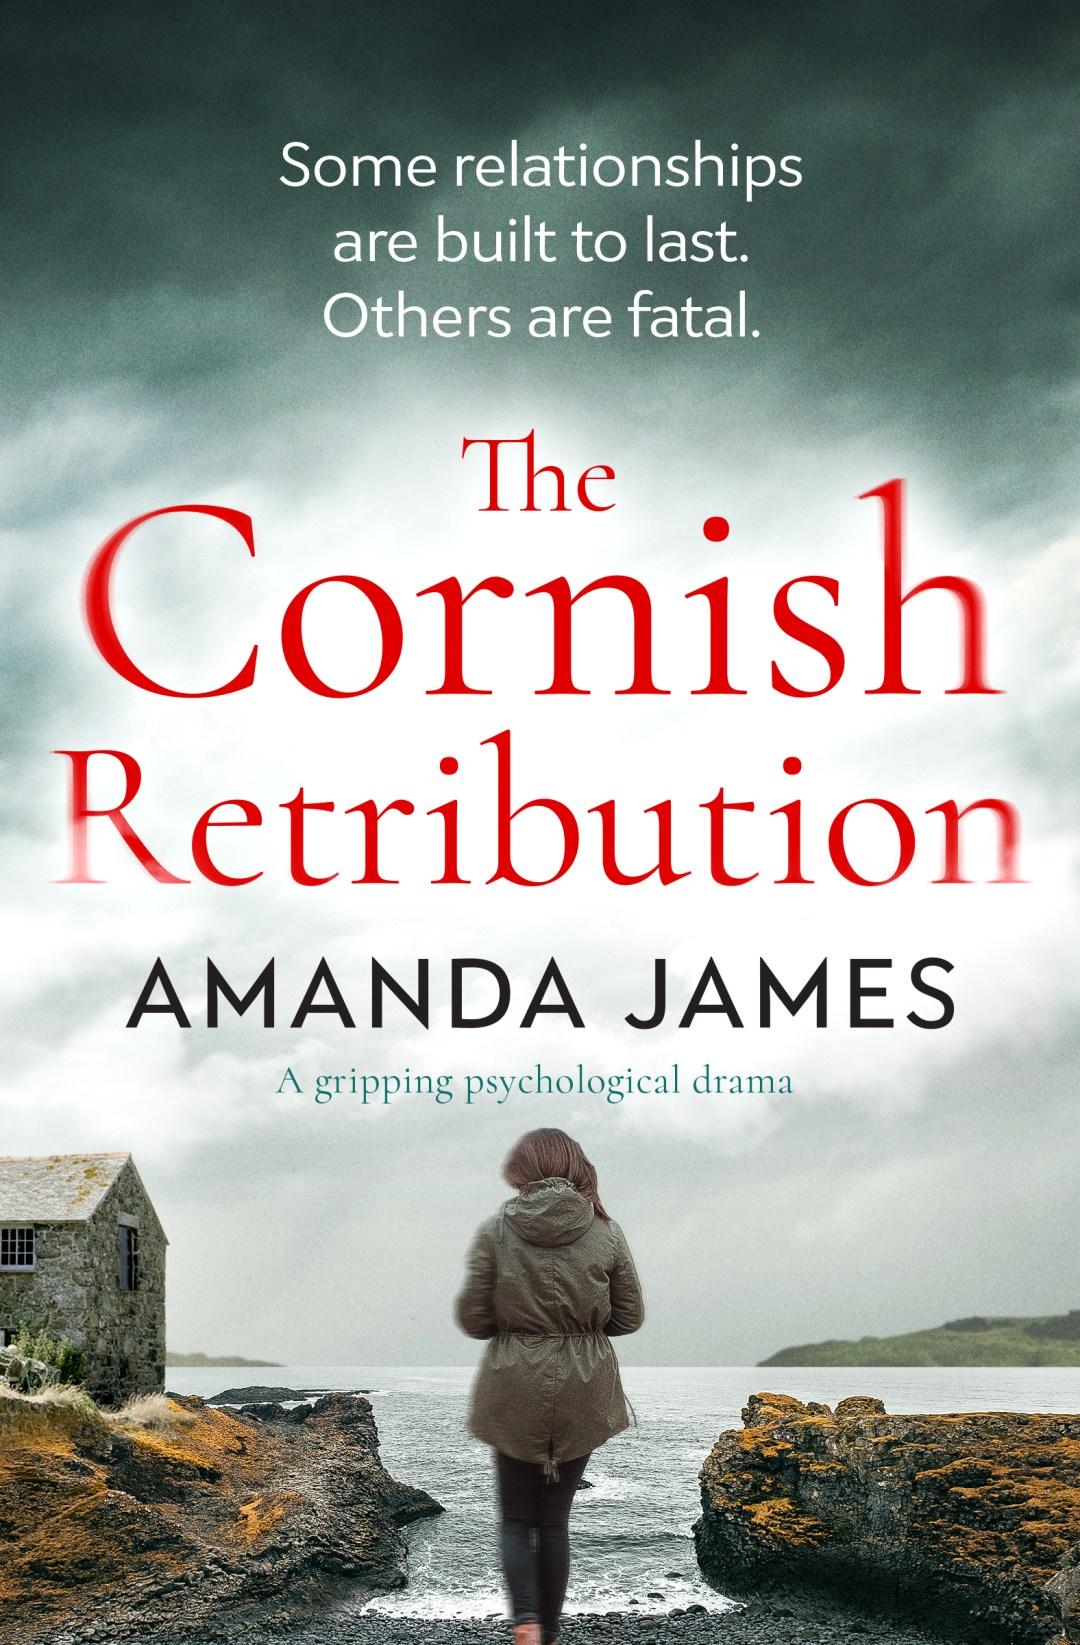 #BookReview of The Cornish Retribution by Amanda James @akjames61 @bloodhoundbook